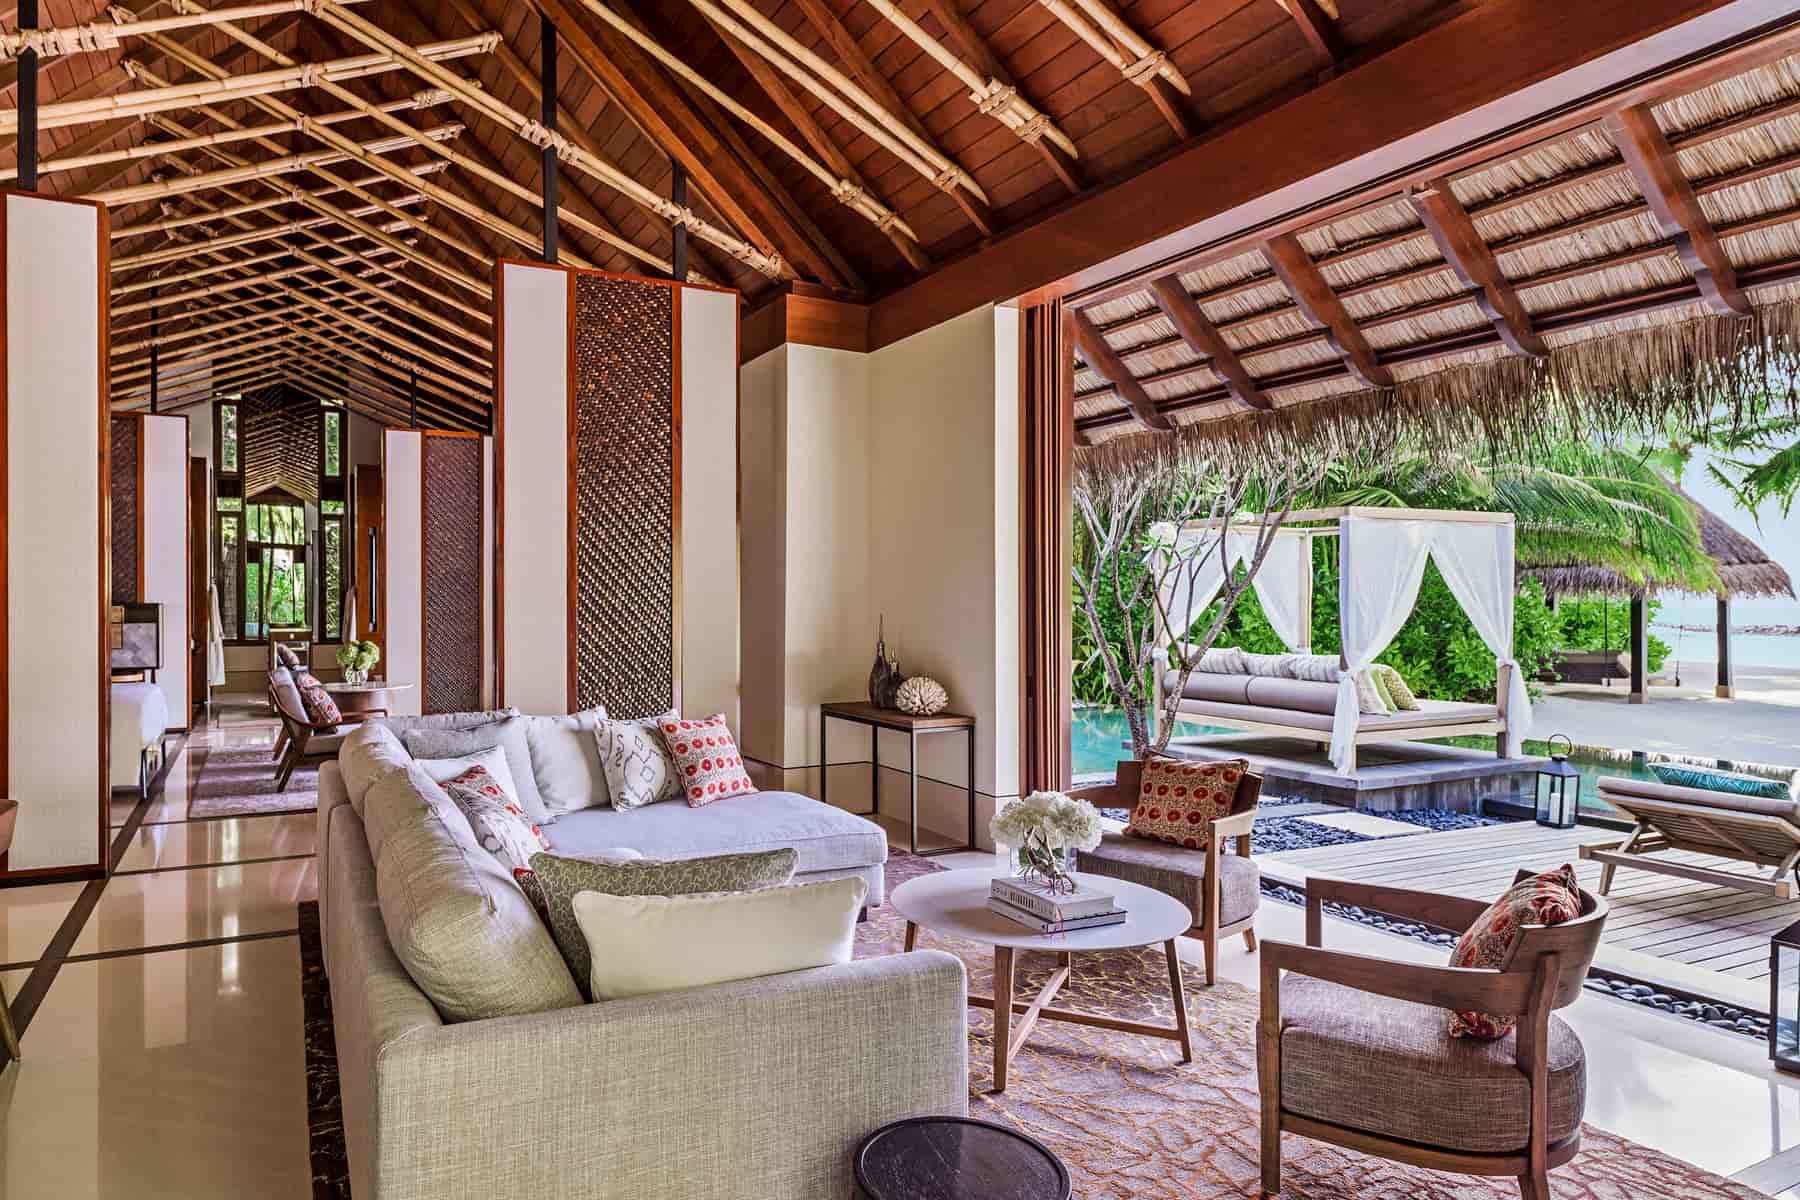 Resort Maldive One & Only Reehi Rah grand beach villa with pool